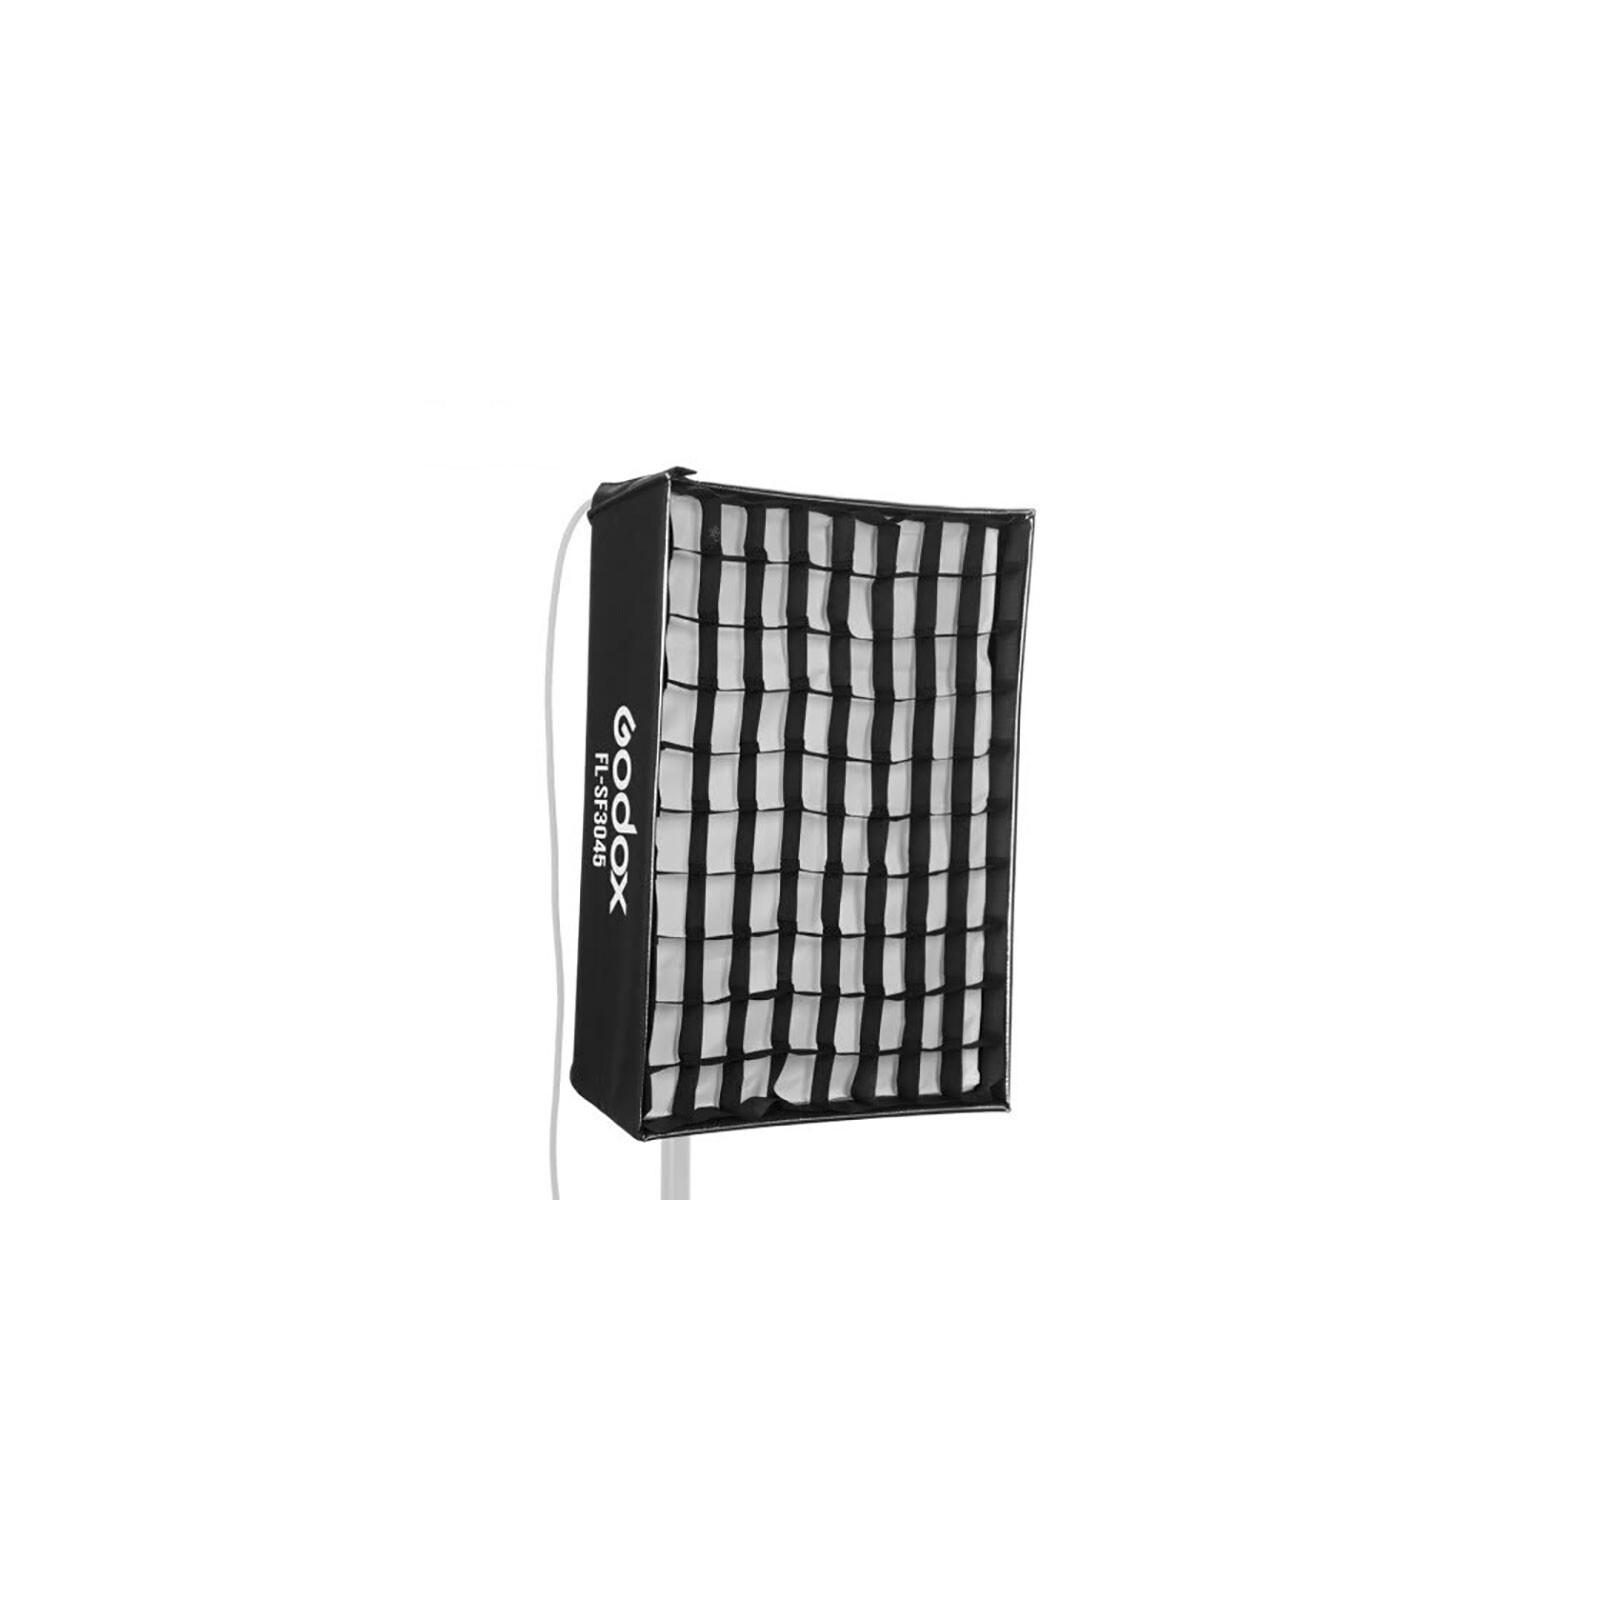 GODOX Softbox für Flexible LED Light 30x45cm